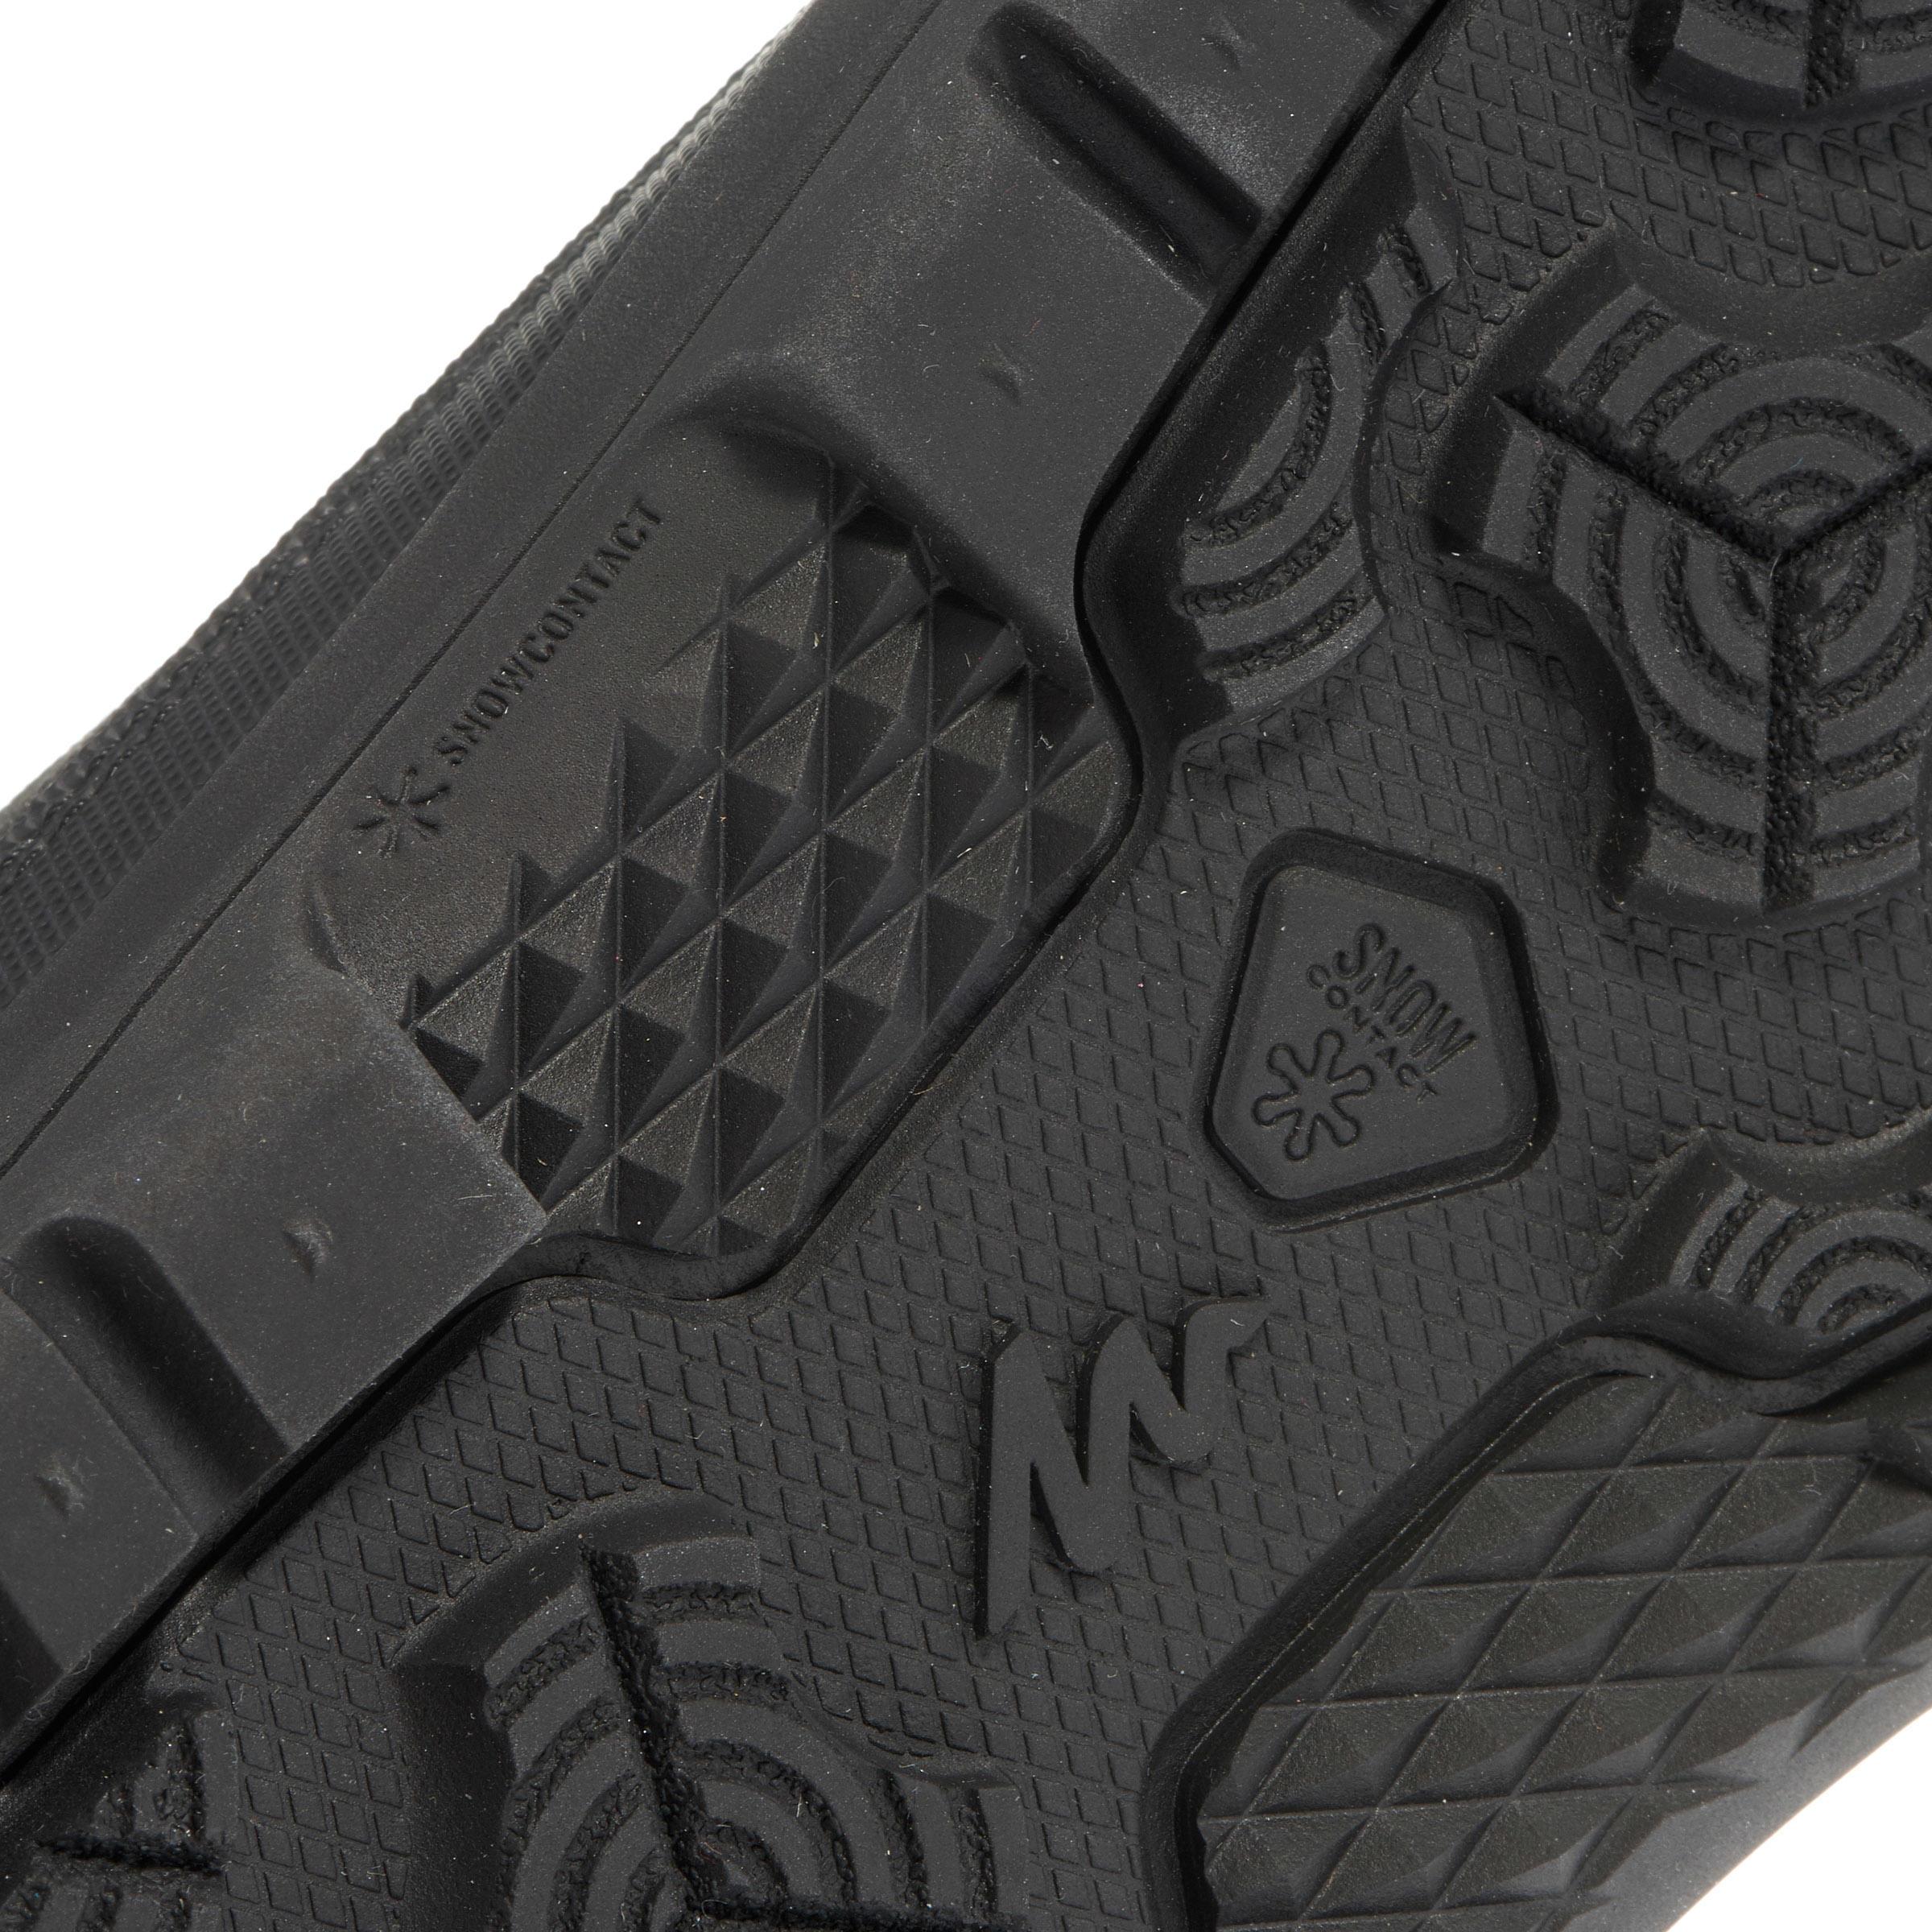 Men's Snow Hiking Shoes SH100 (High Ankle) - Black